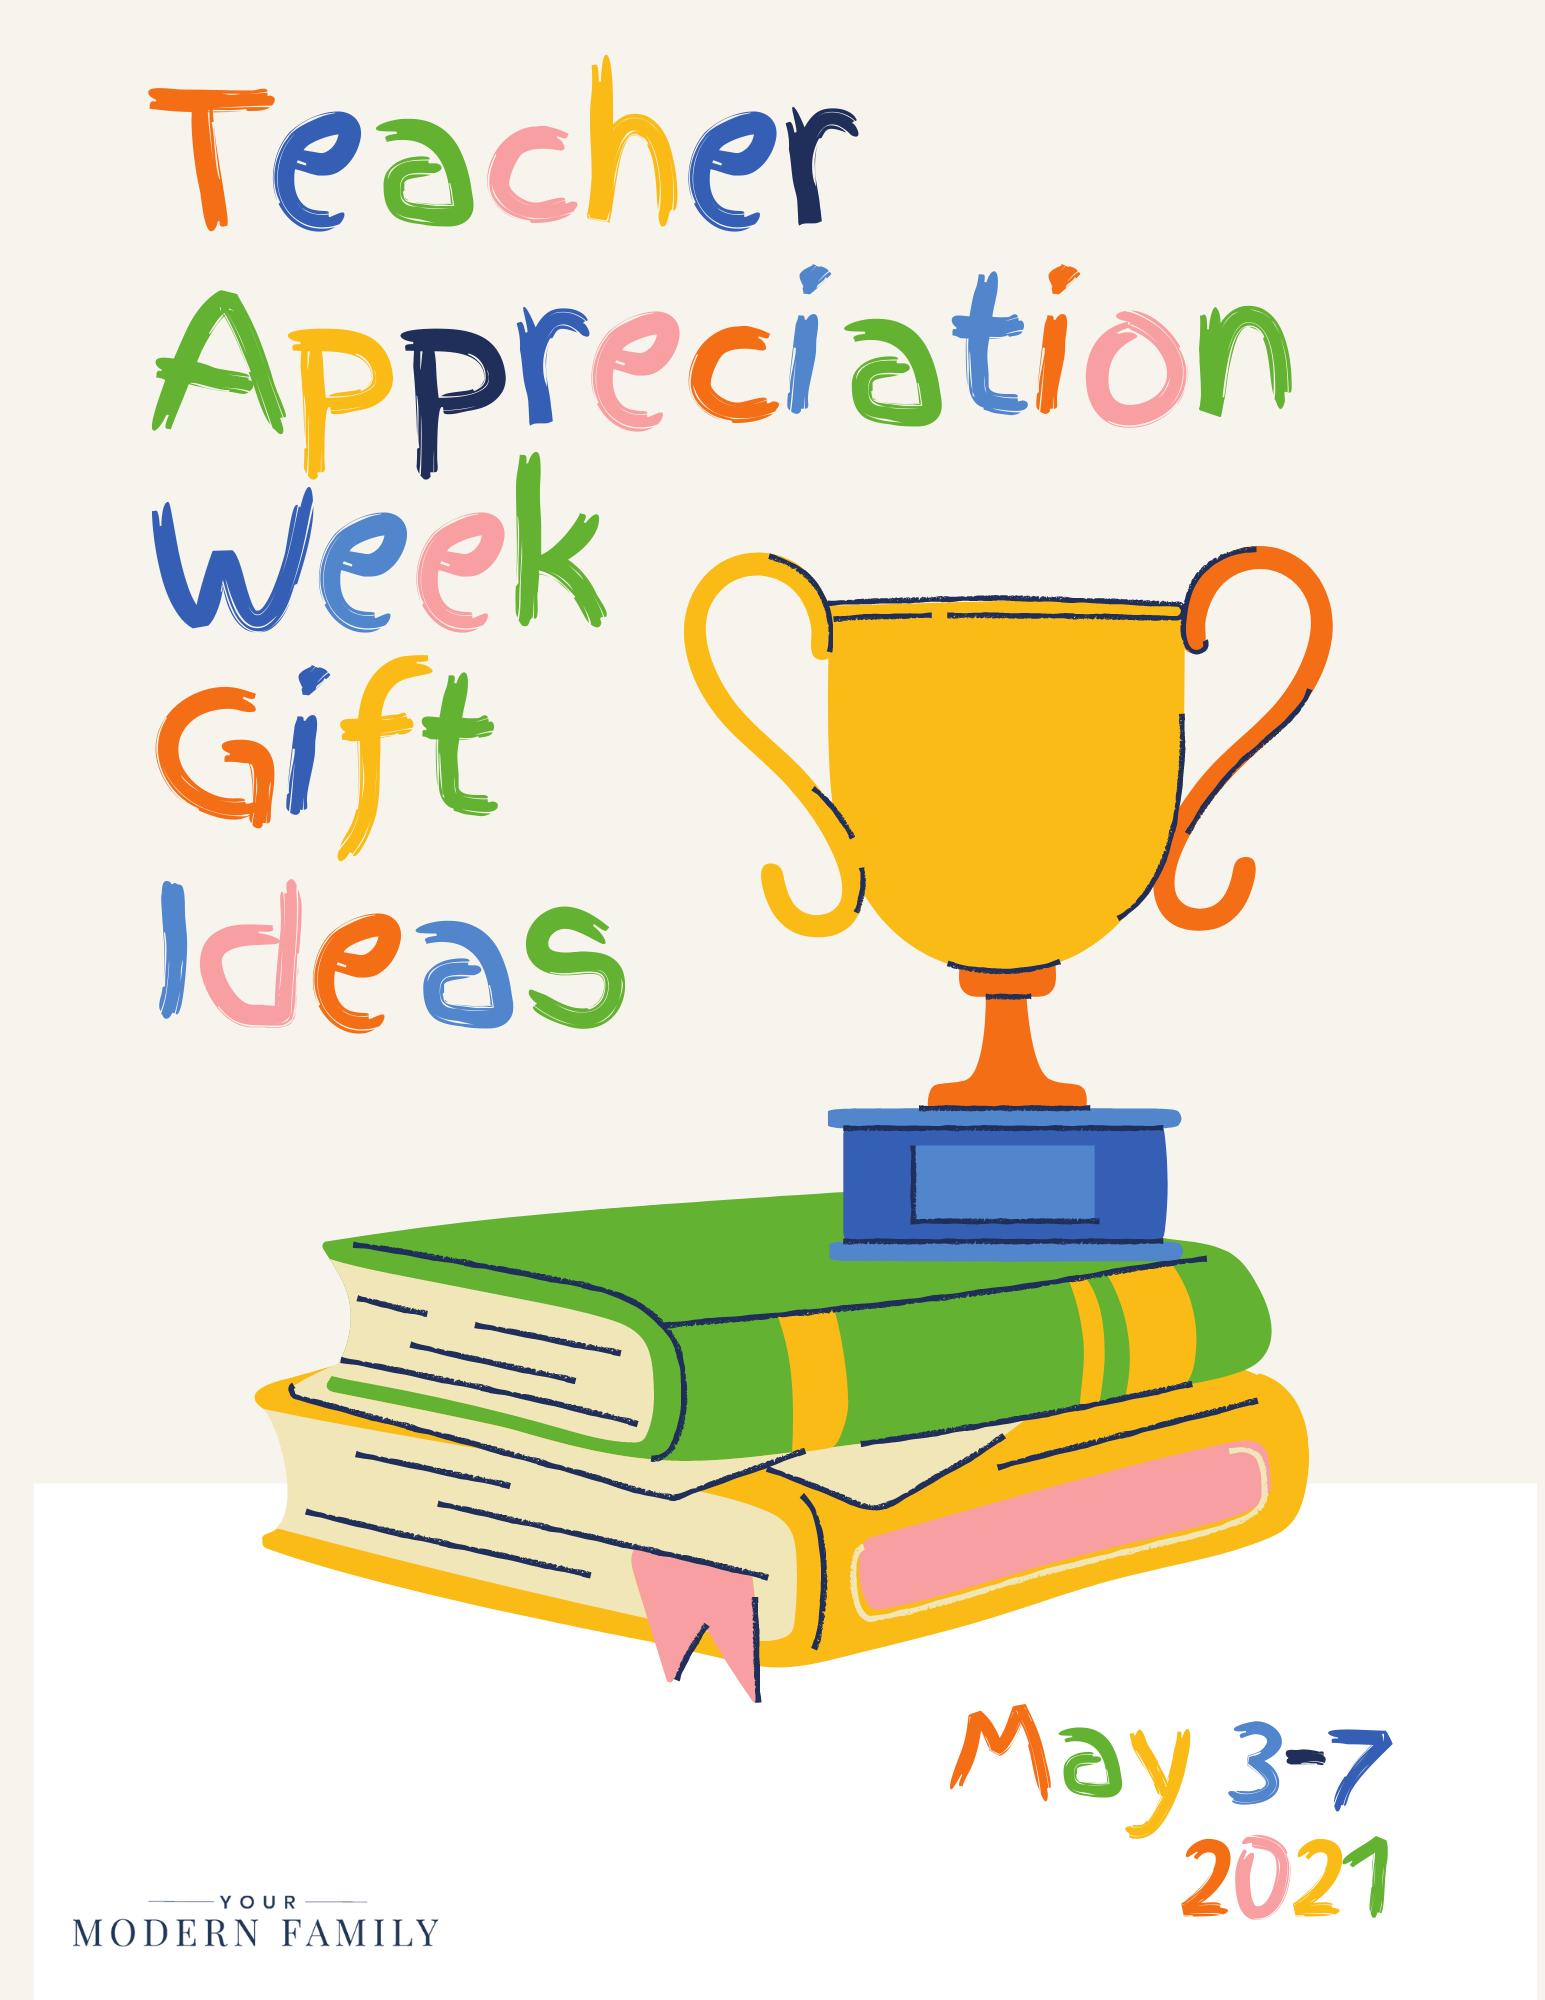 What Teachers Really Want for Teacher Appreciation Week